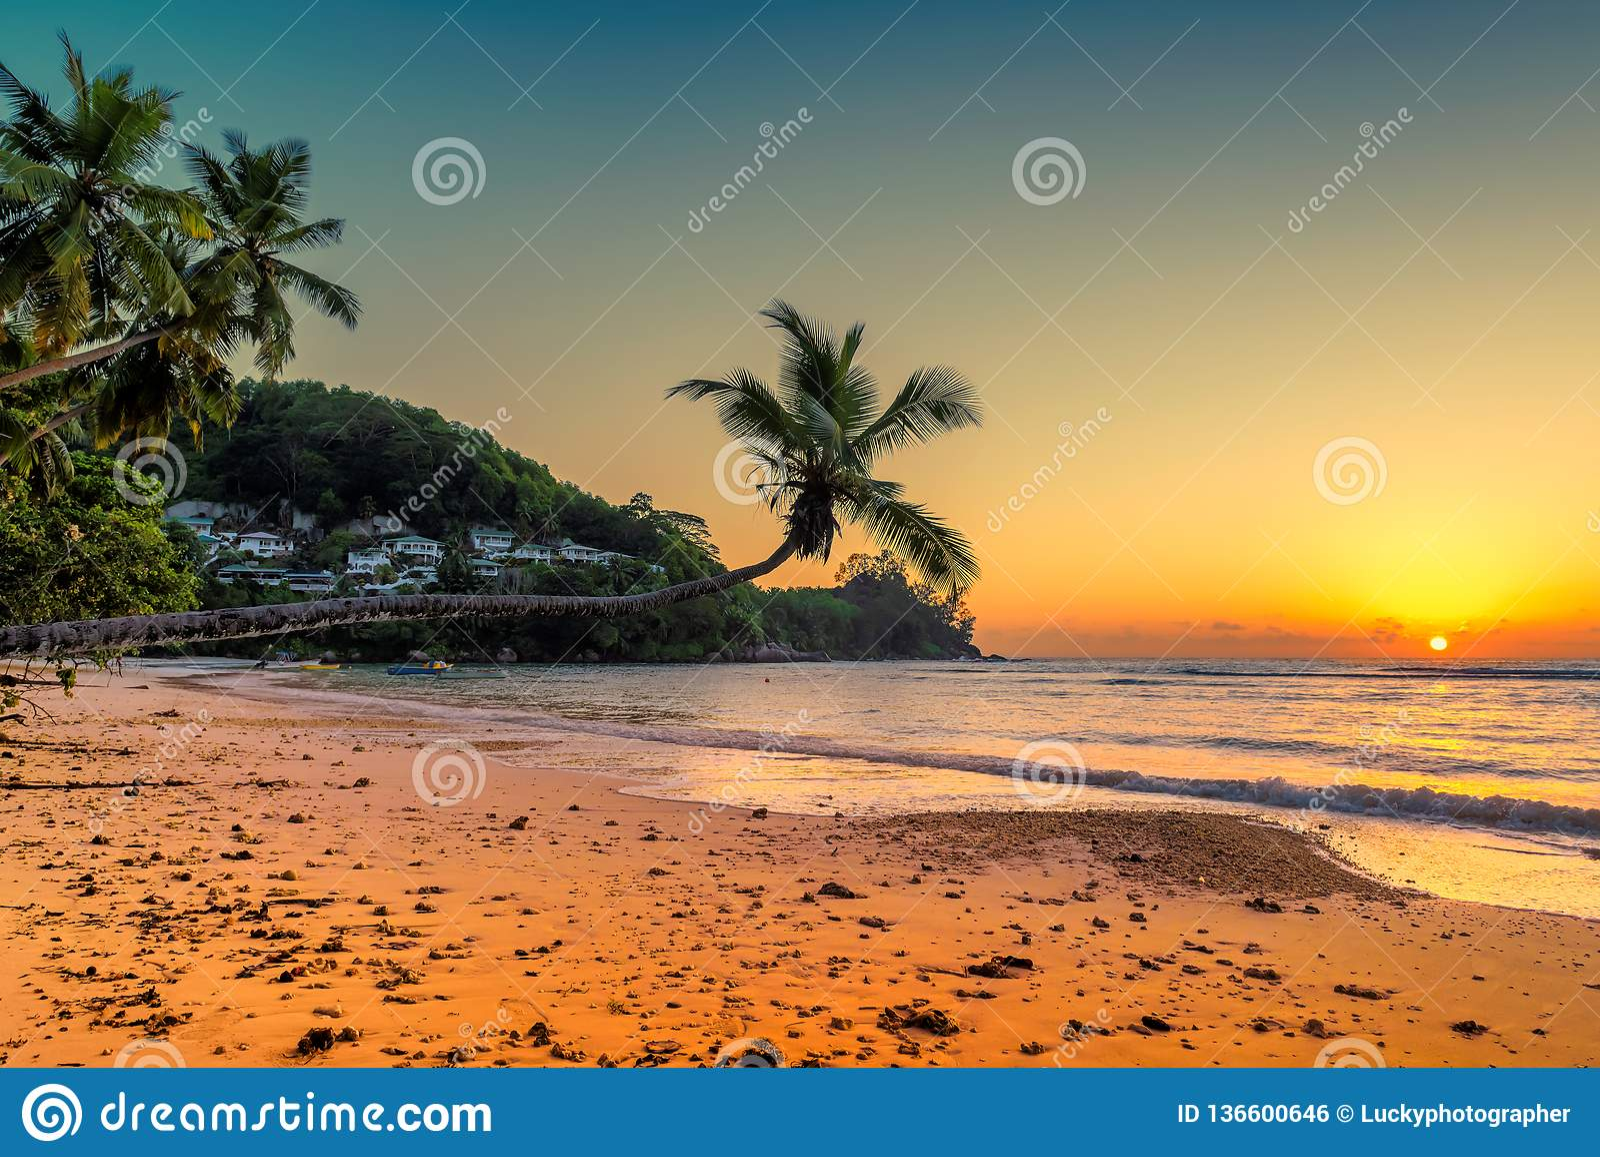 Kokospalmen bij zonsondergang over tropisch strand